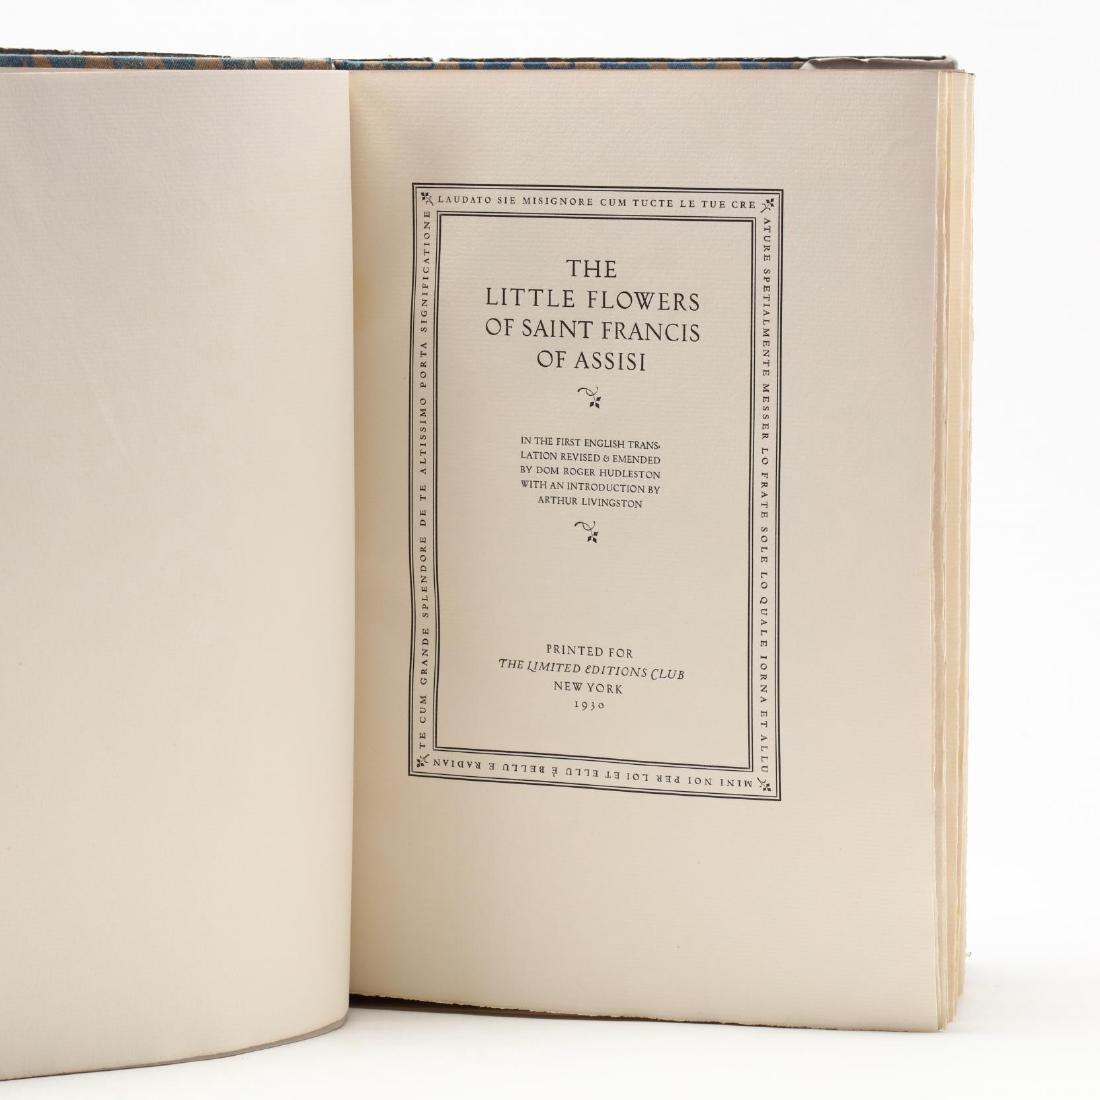 Three Prewar Limited Editions Club Slipcased Books With - 3